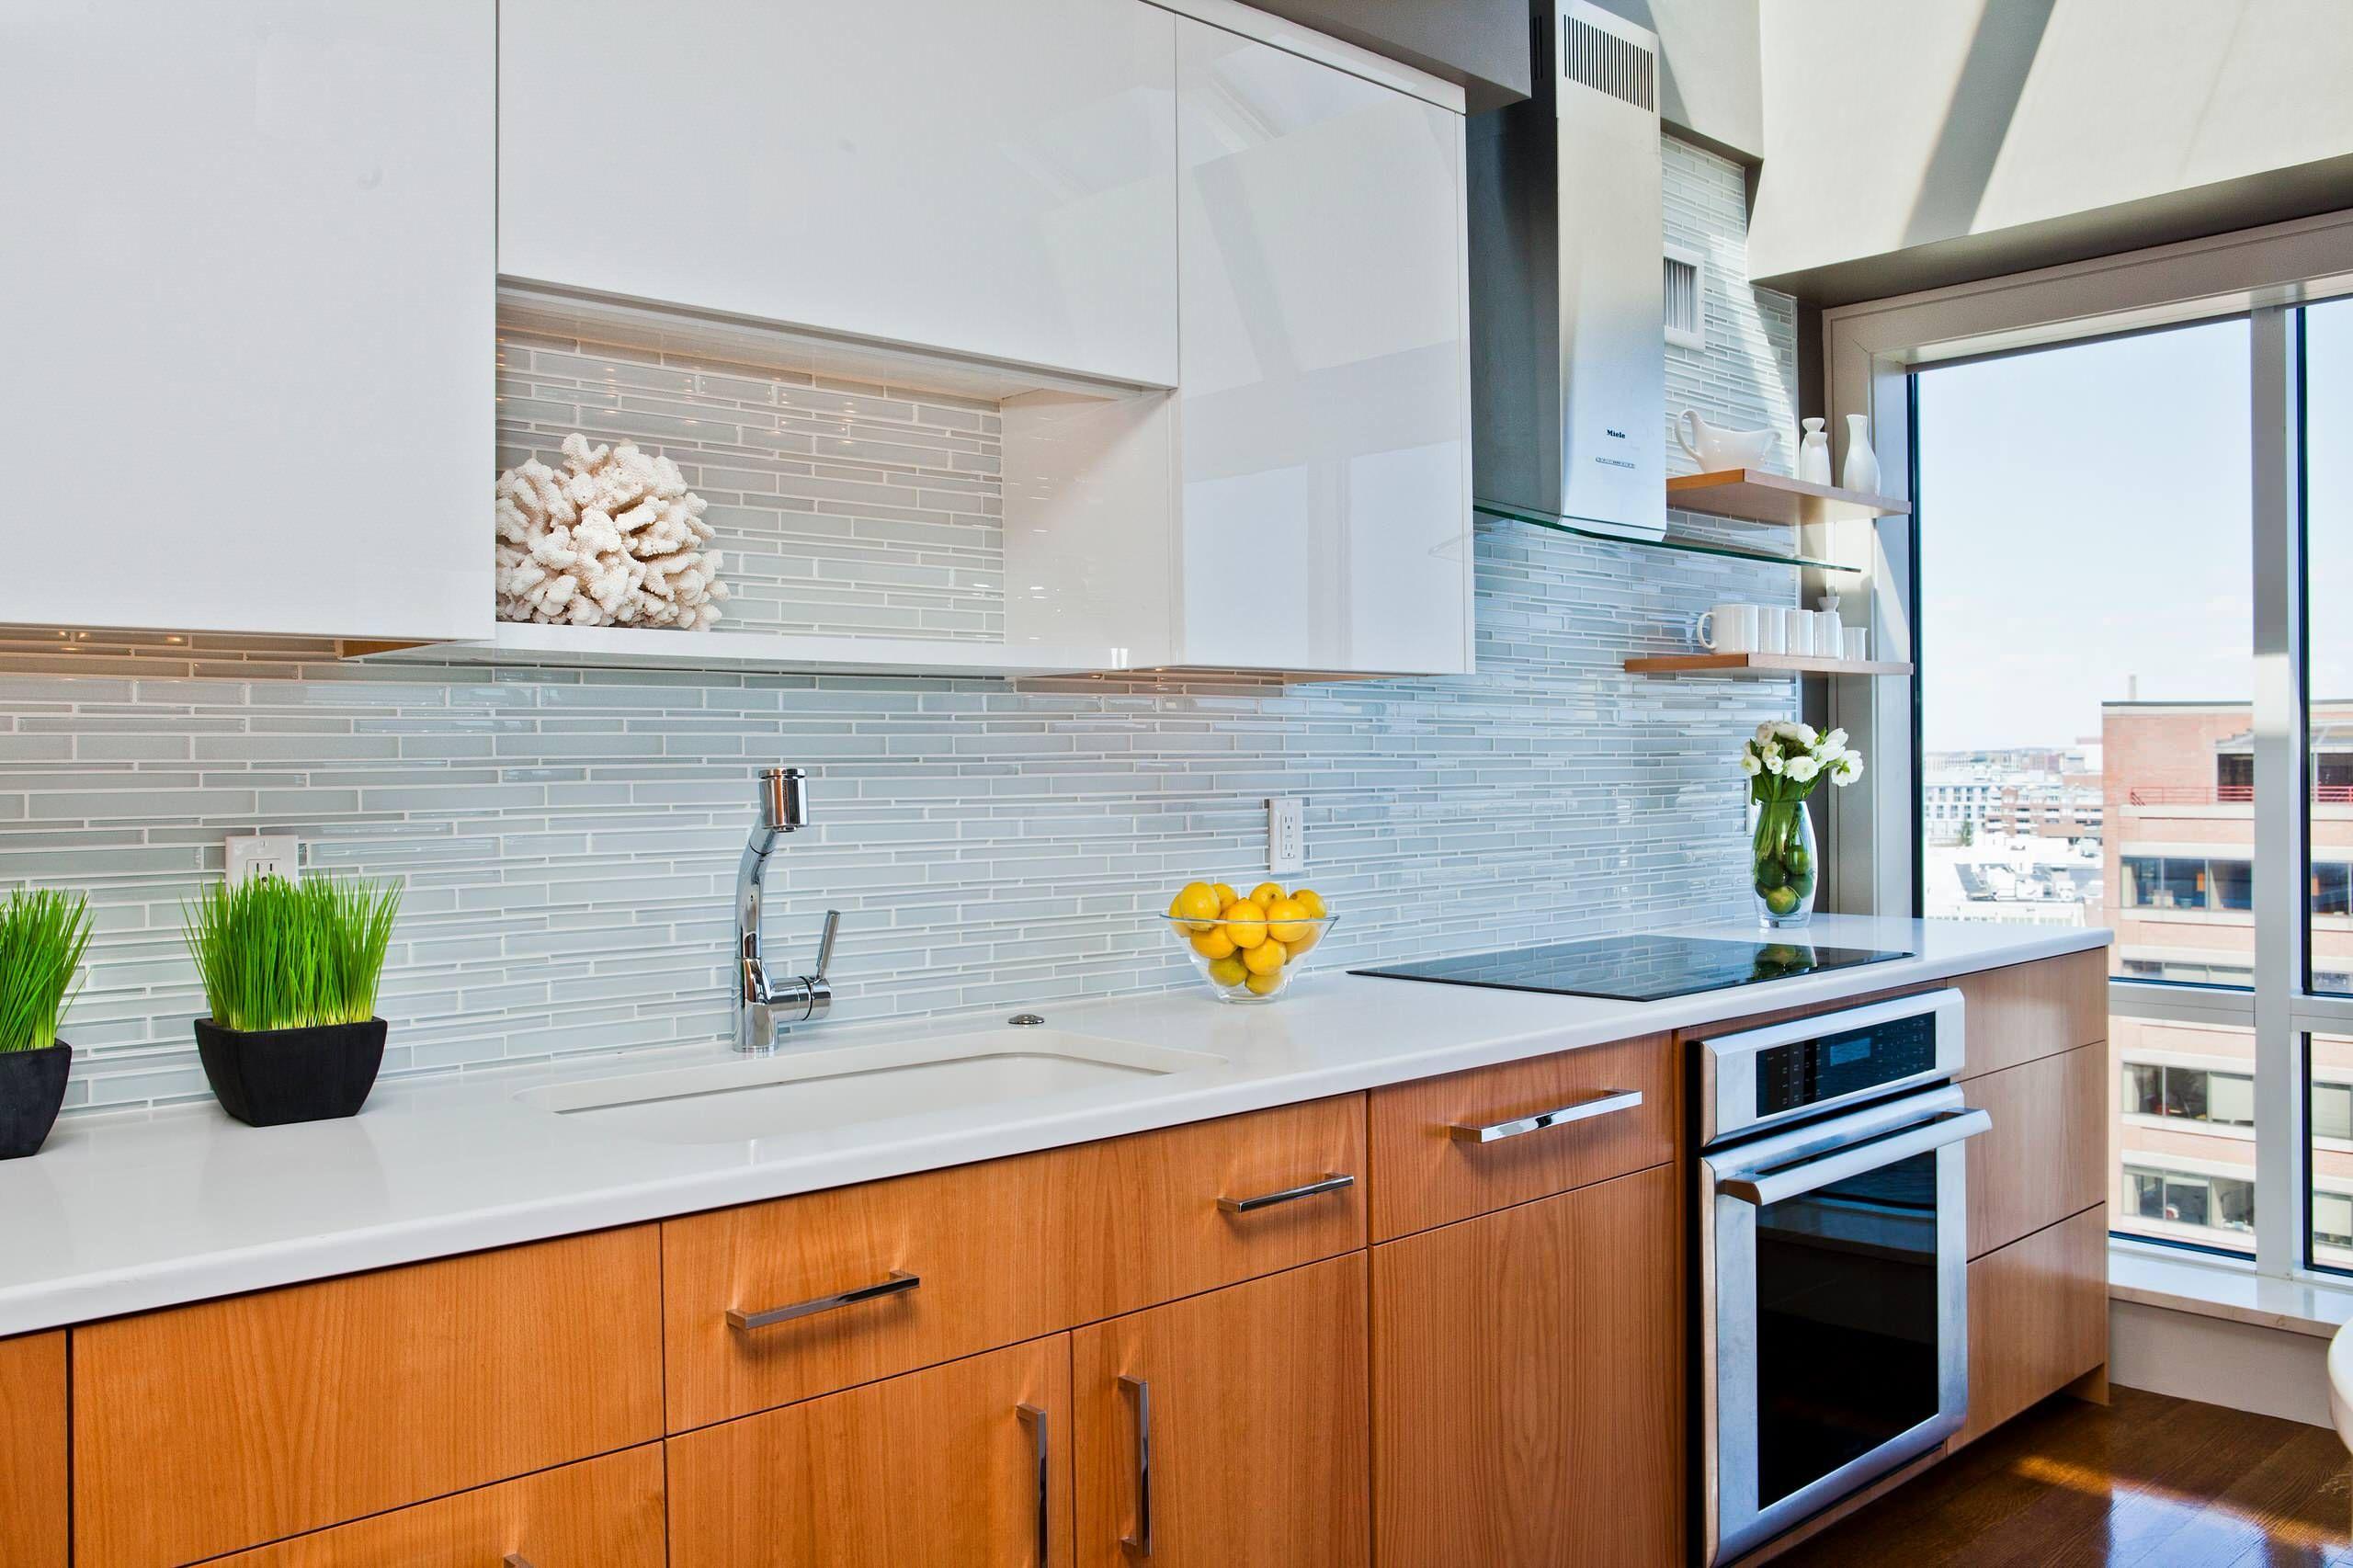 Updated Inexpensive Backsplash Creates a Stunning Kitchen: Two Tone ...